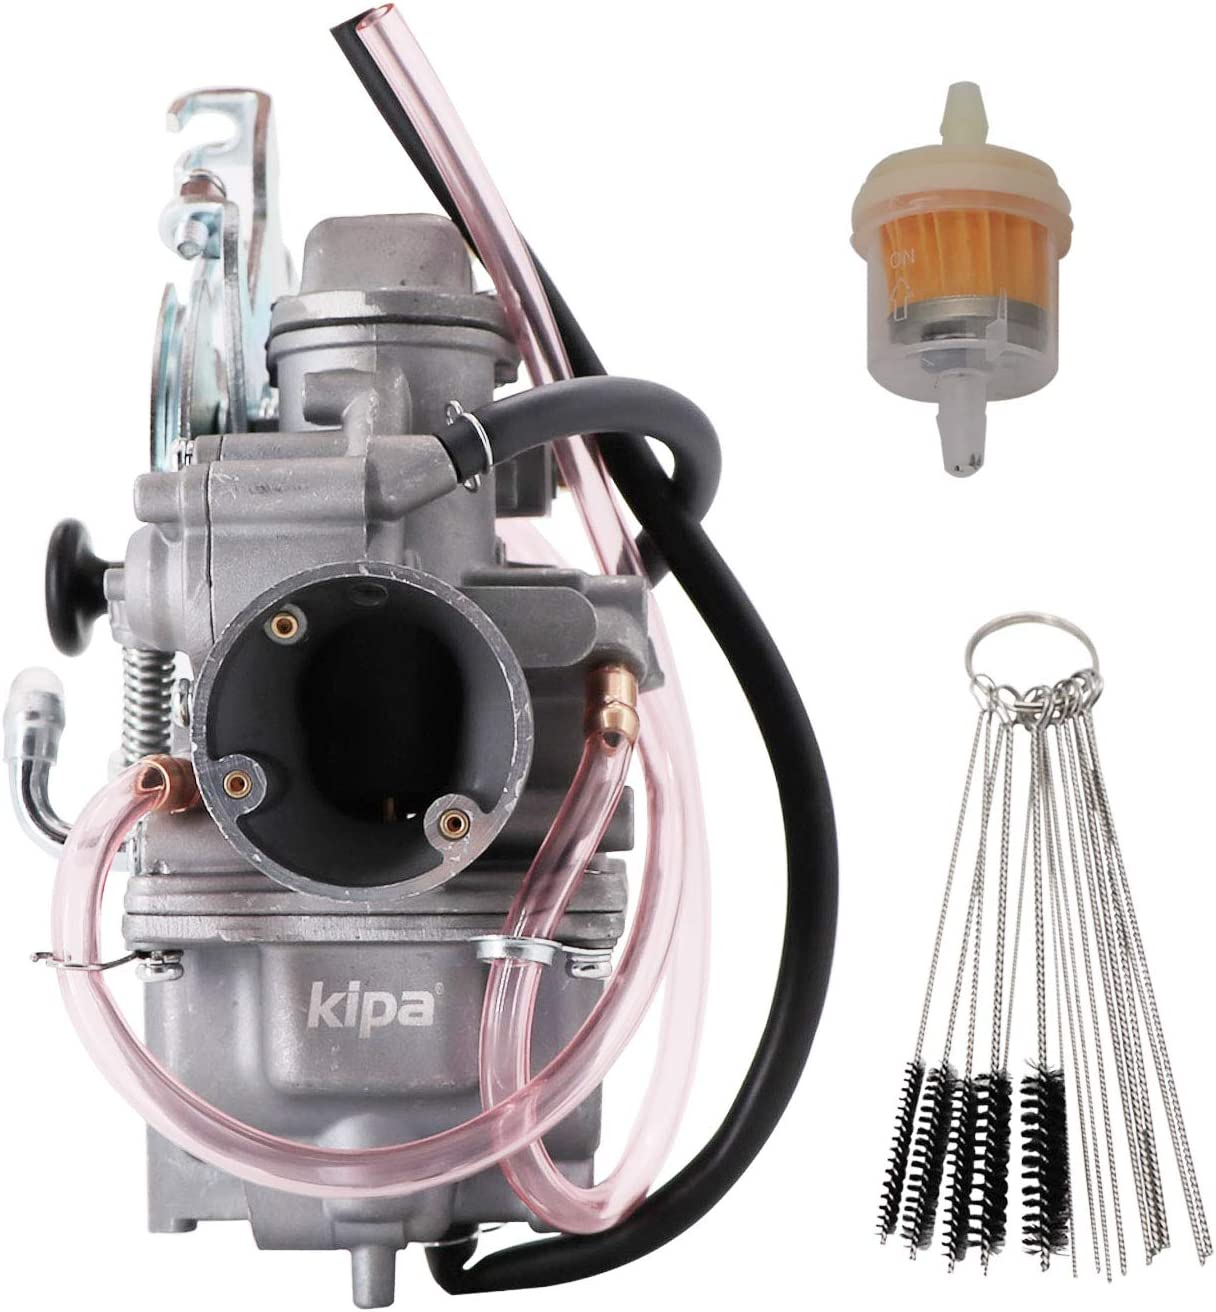 KIPA Carburetor for Yamaha TTR-230 TTR 230 Pit Dirt Bike 2005-2009 Replace OE Part # 1C6-14301-00-00 With Filter /& Carbon Dirt Jet Cleaner Tool Kit Durable